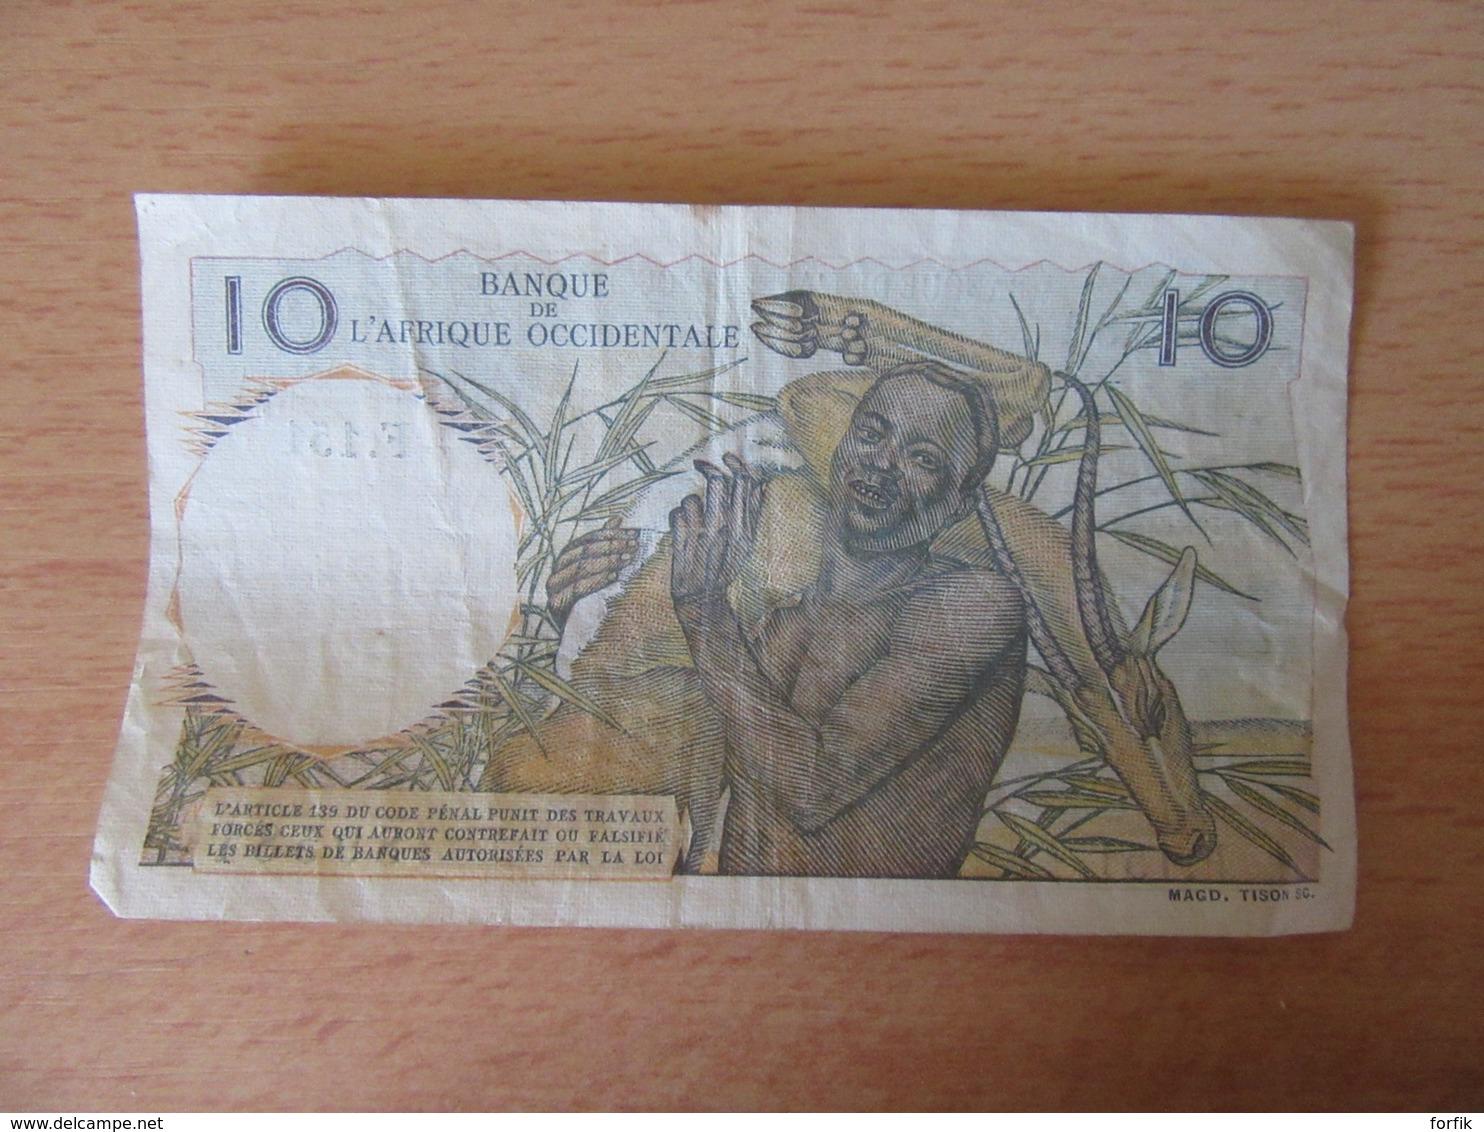 Banque De L'Afrique Occidentale - Billet 10 Francs 28-10-1954 - Alphabet F.151 / 89591 - West African States